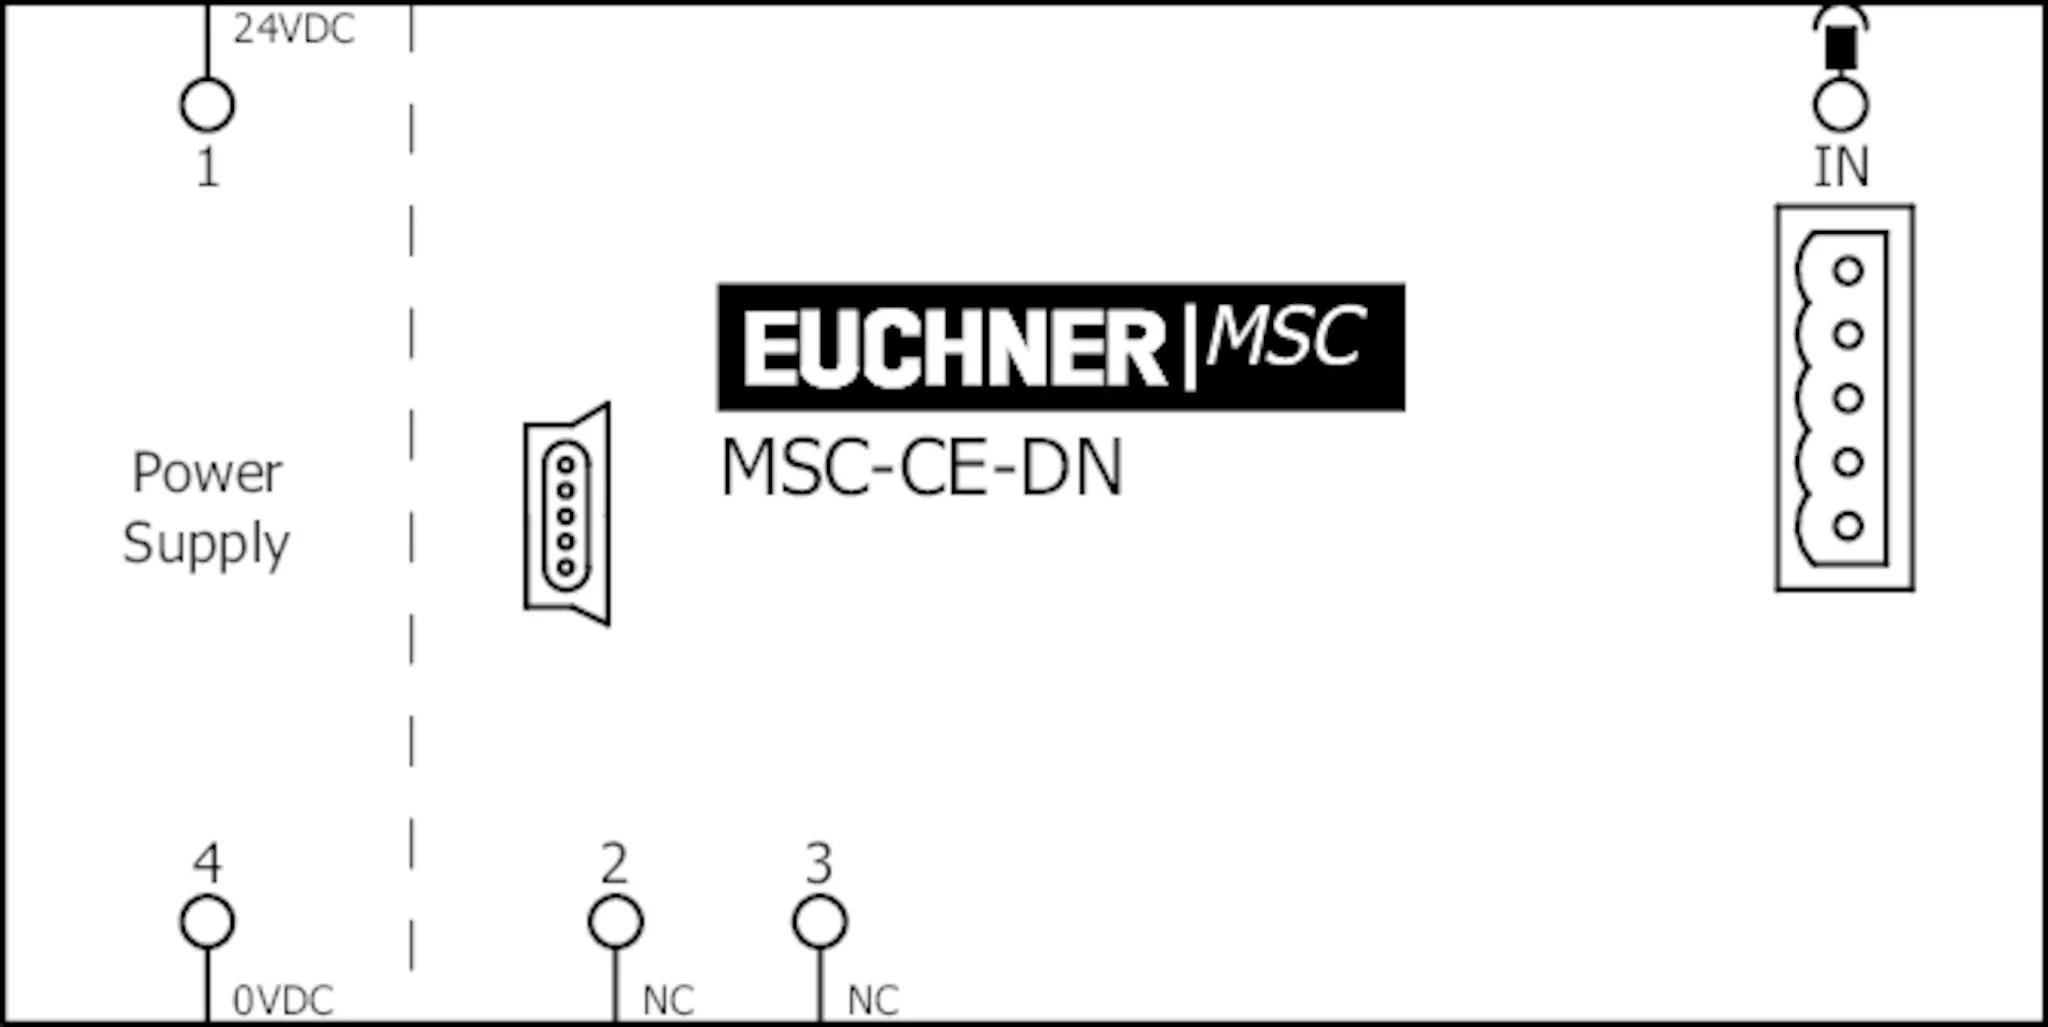 MSC-CE-DN-121311 Expansion device MSC-CE | EUCHNER